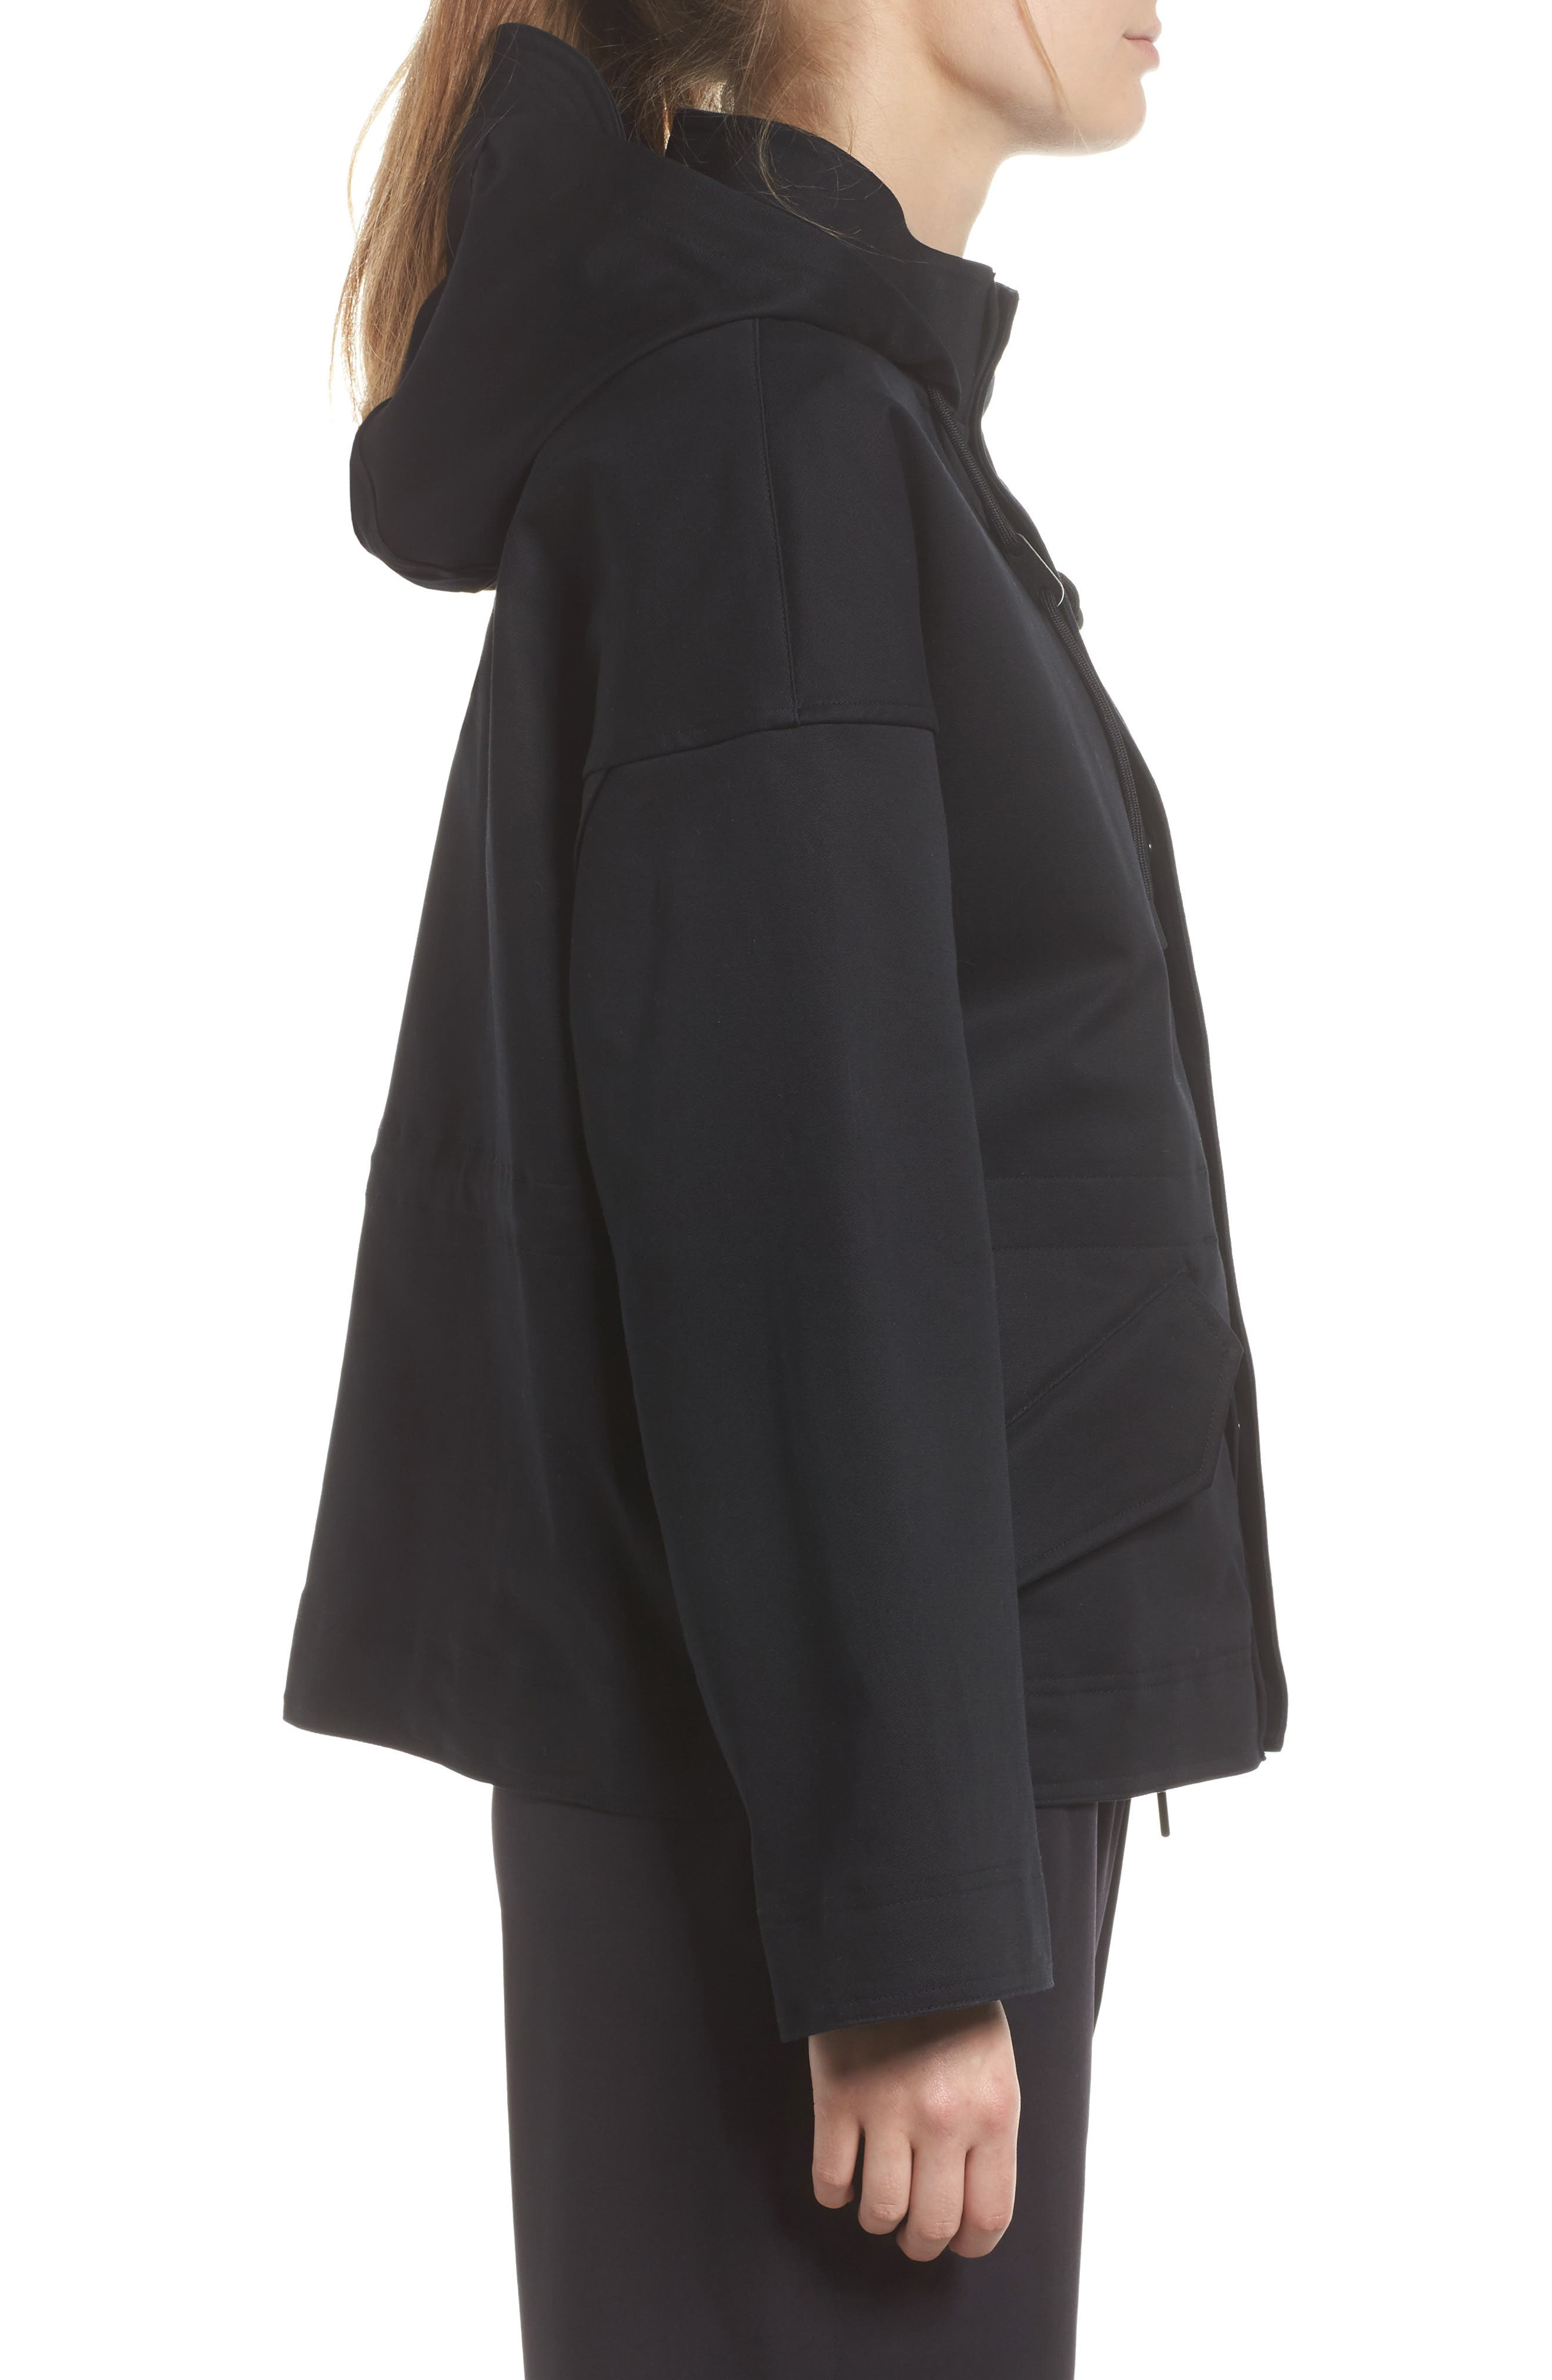 NikeLab Collection Women's Tactical Jacket,                             Alternate thumbnail 3, color,                             Black/ Black